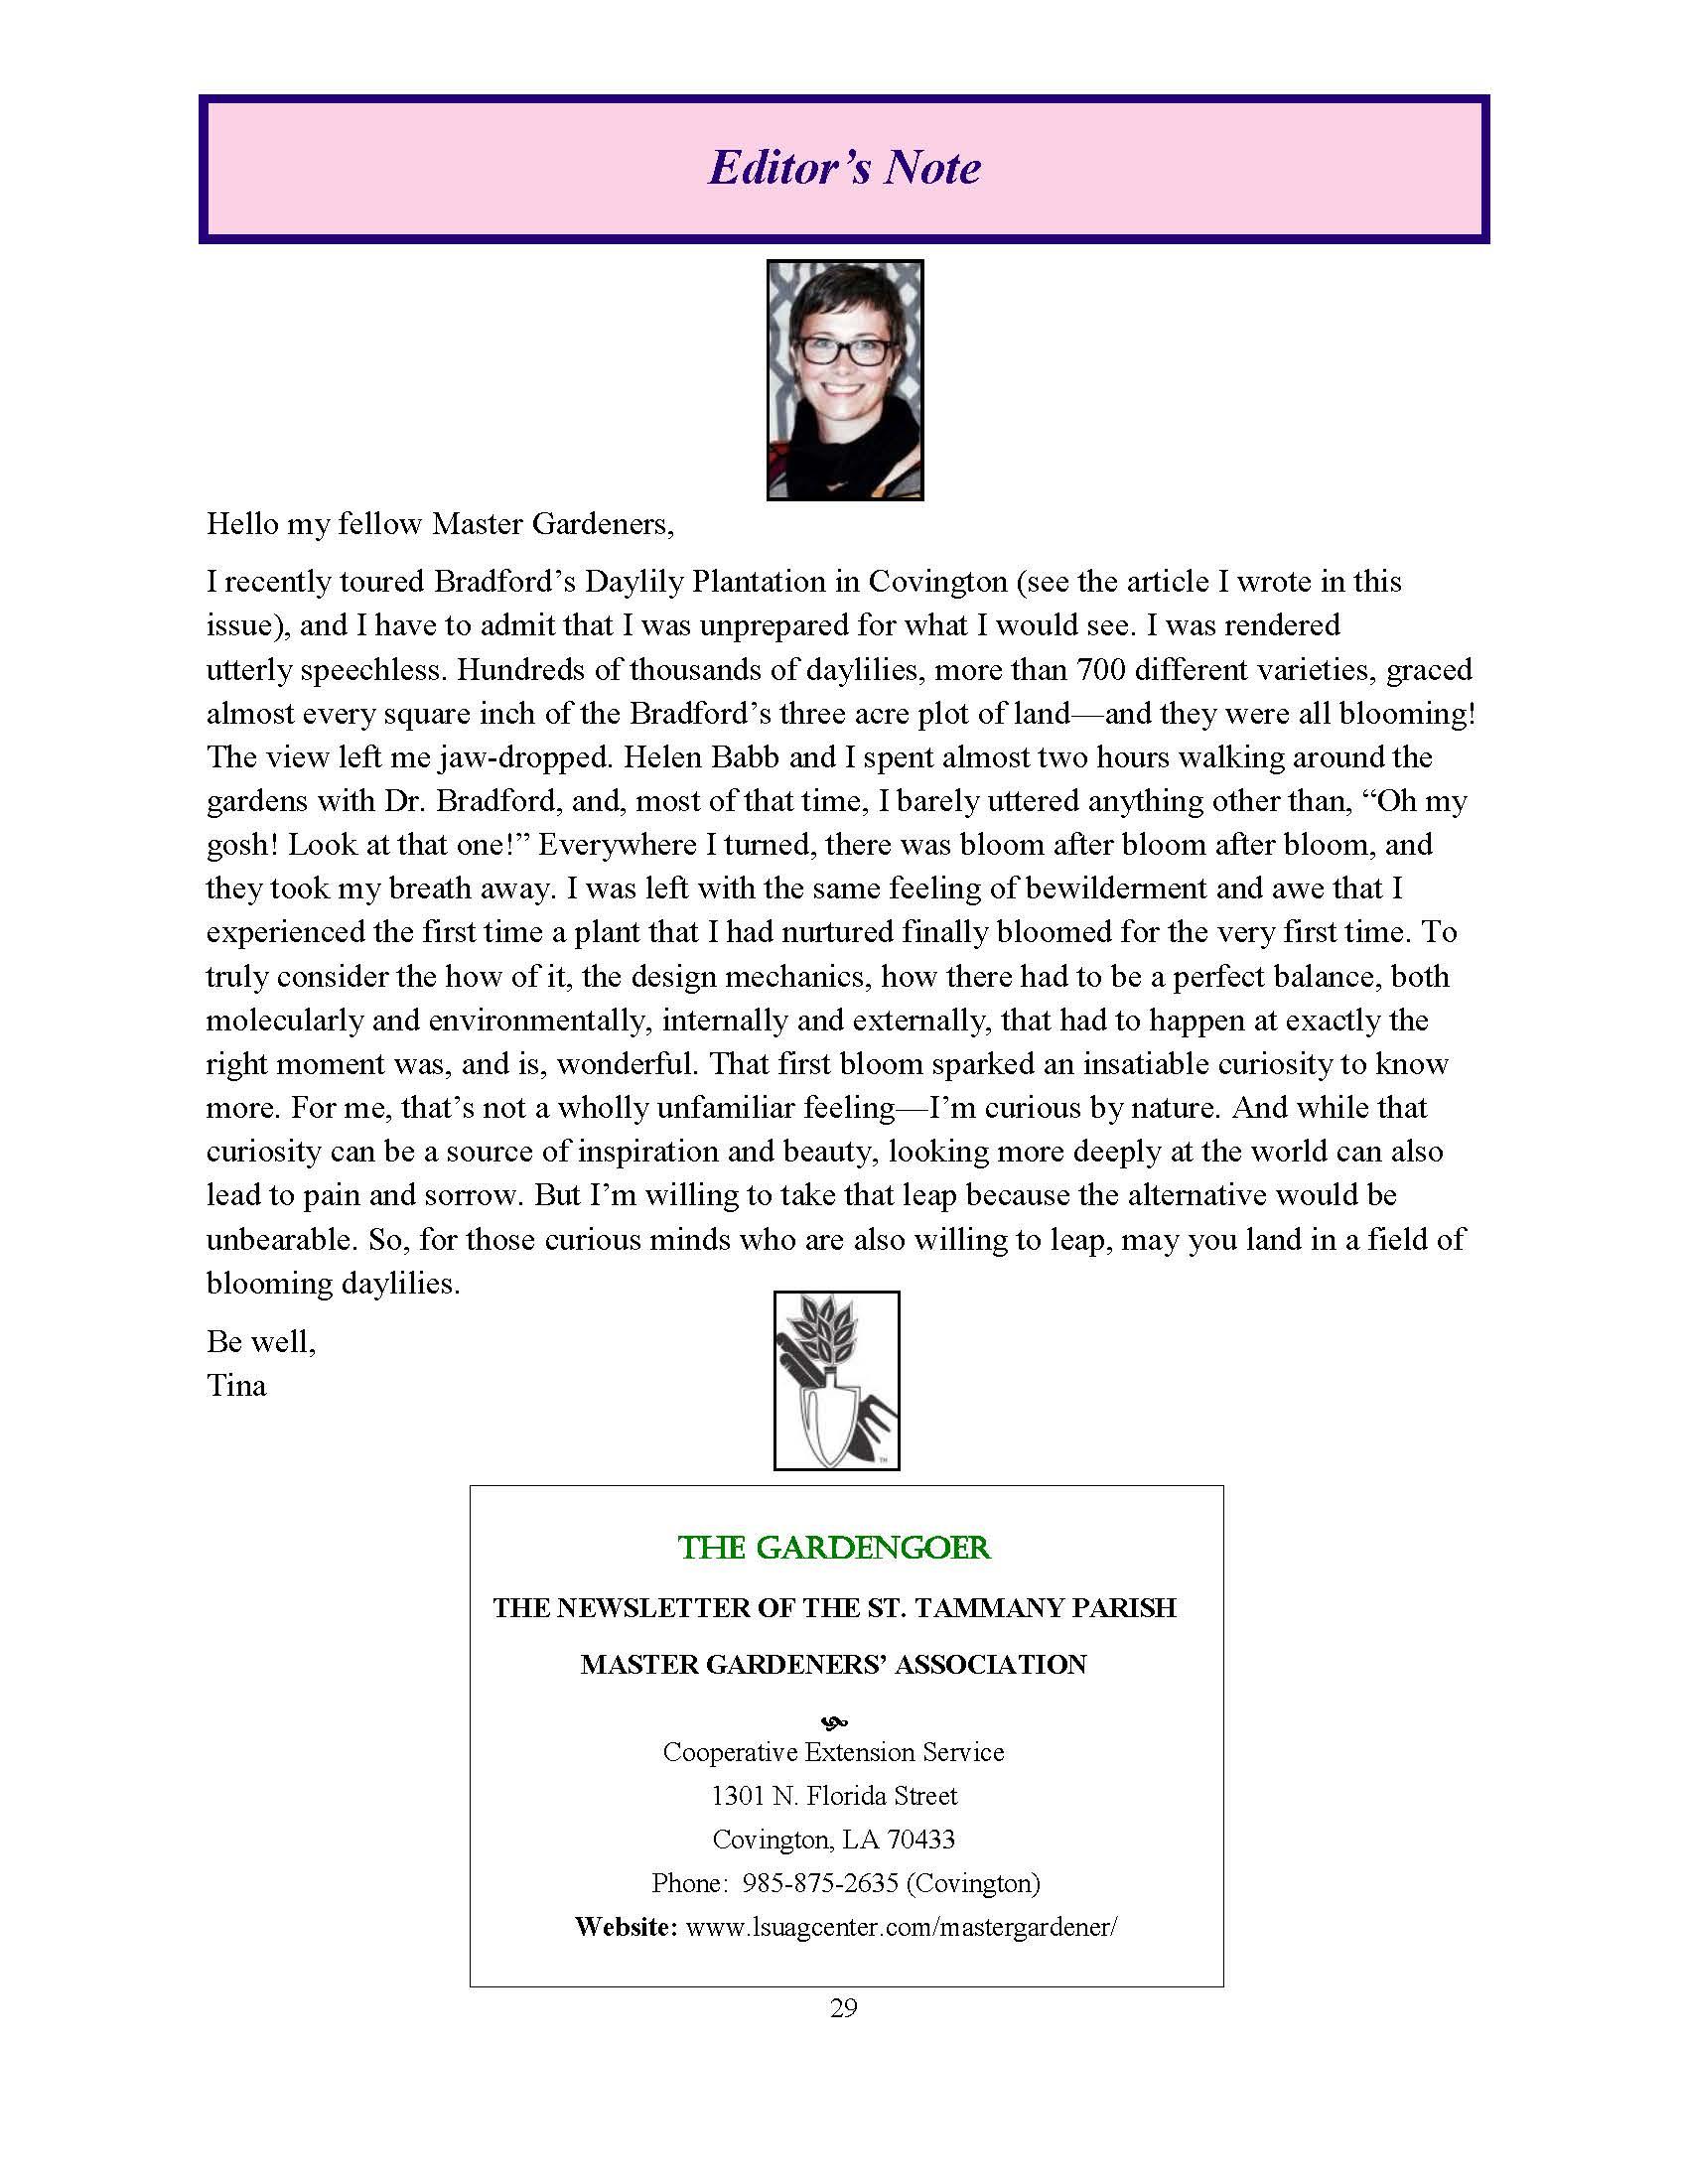 June 2017 Gardengoer_Page_29.jpg